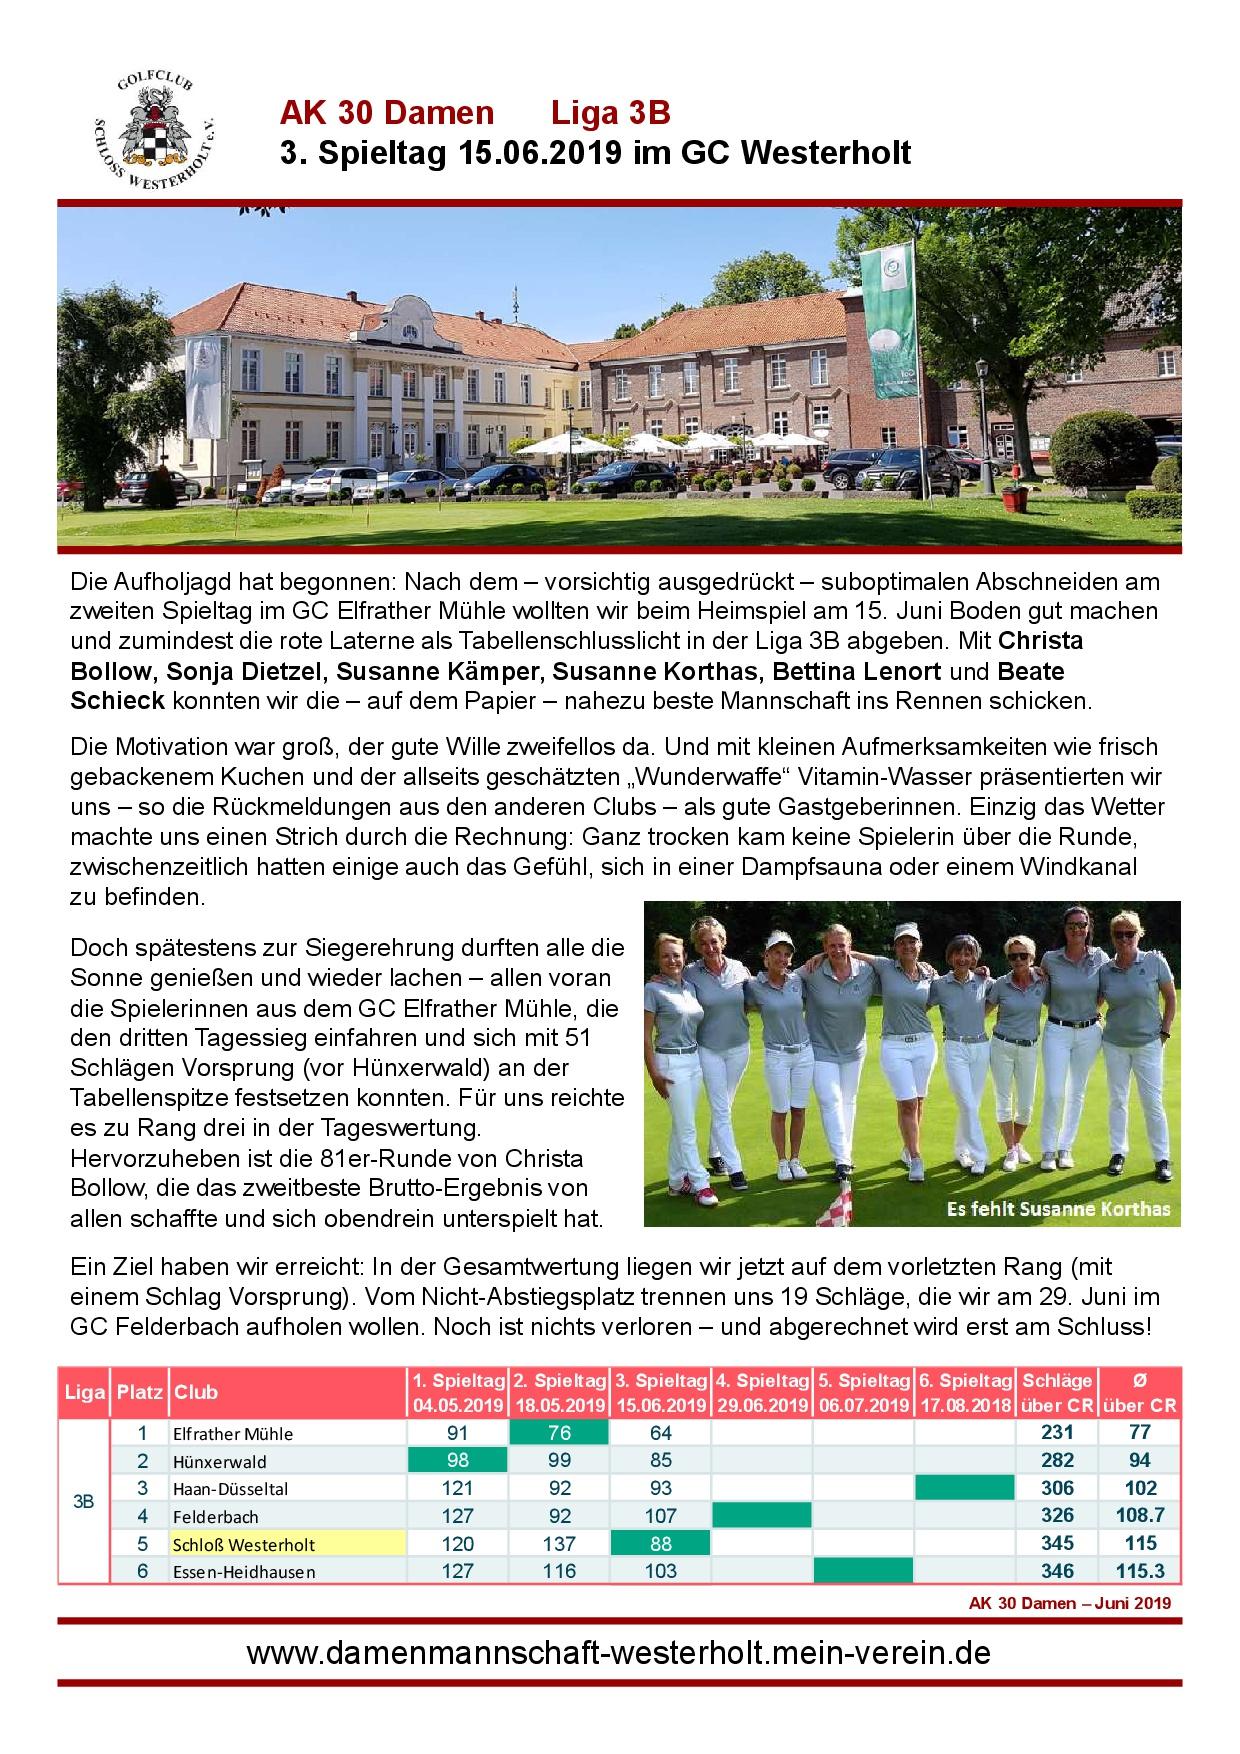 2019 AK 30 06-15 Westerholt Spielbericht.jpg